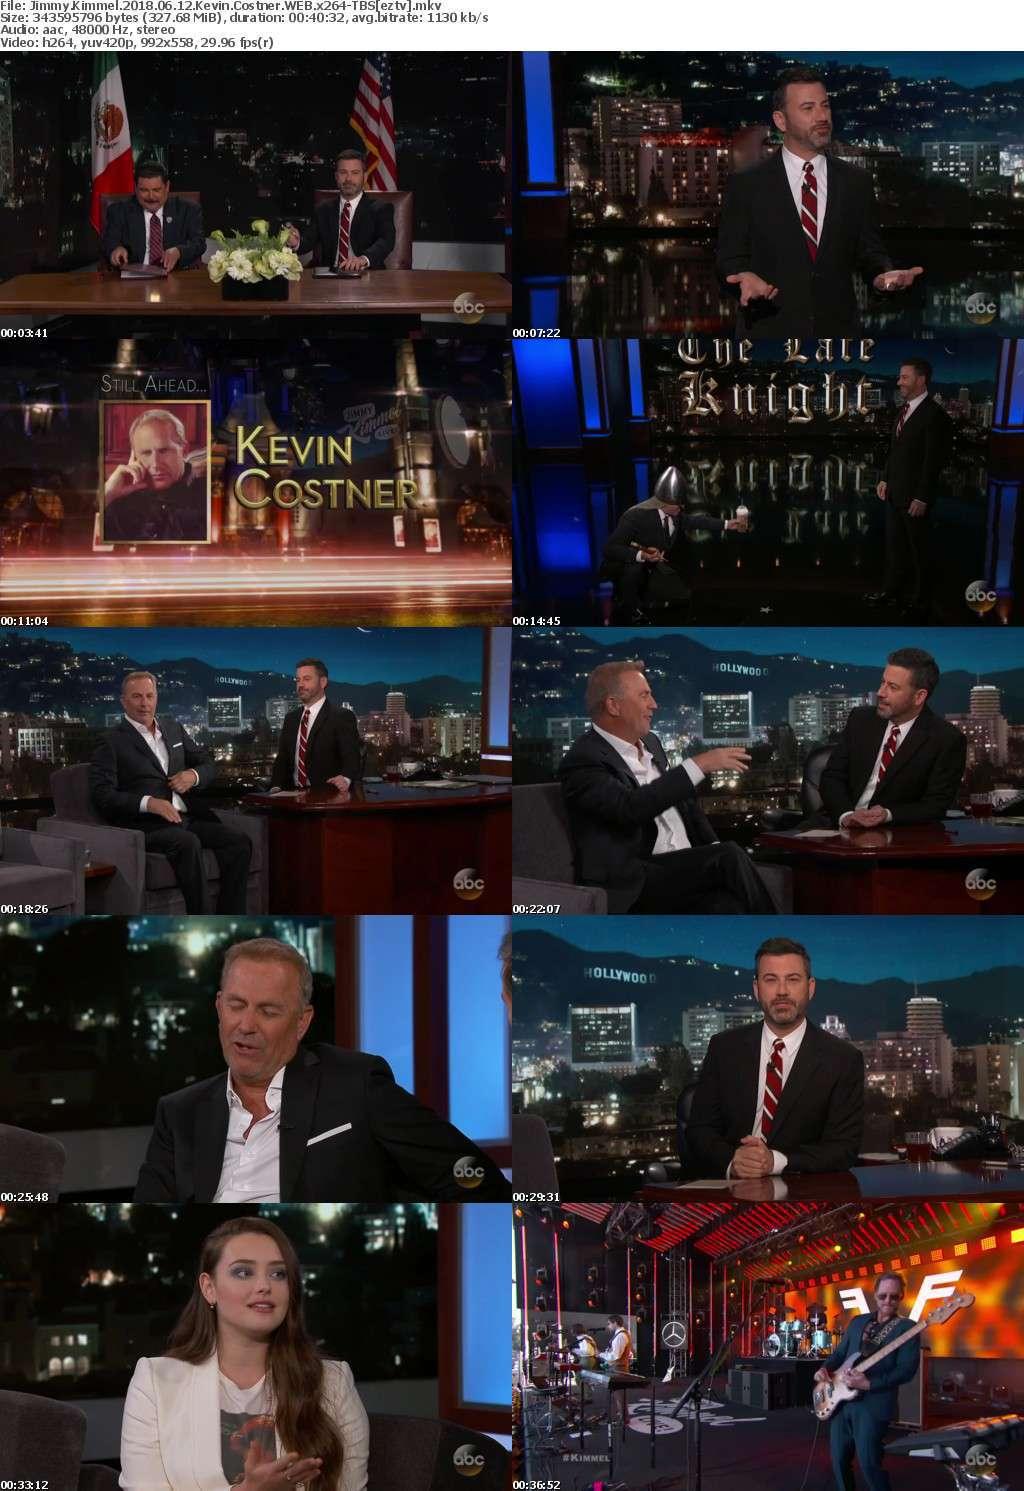 Jimmy Kimmel 2018 06 12 Kevin Costner WEB x264-TBS